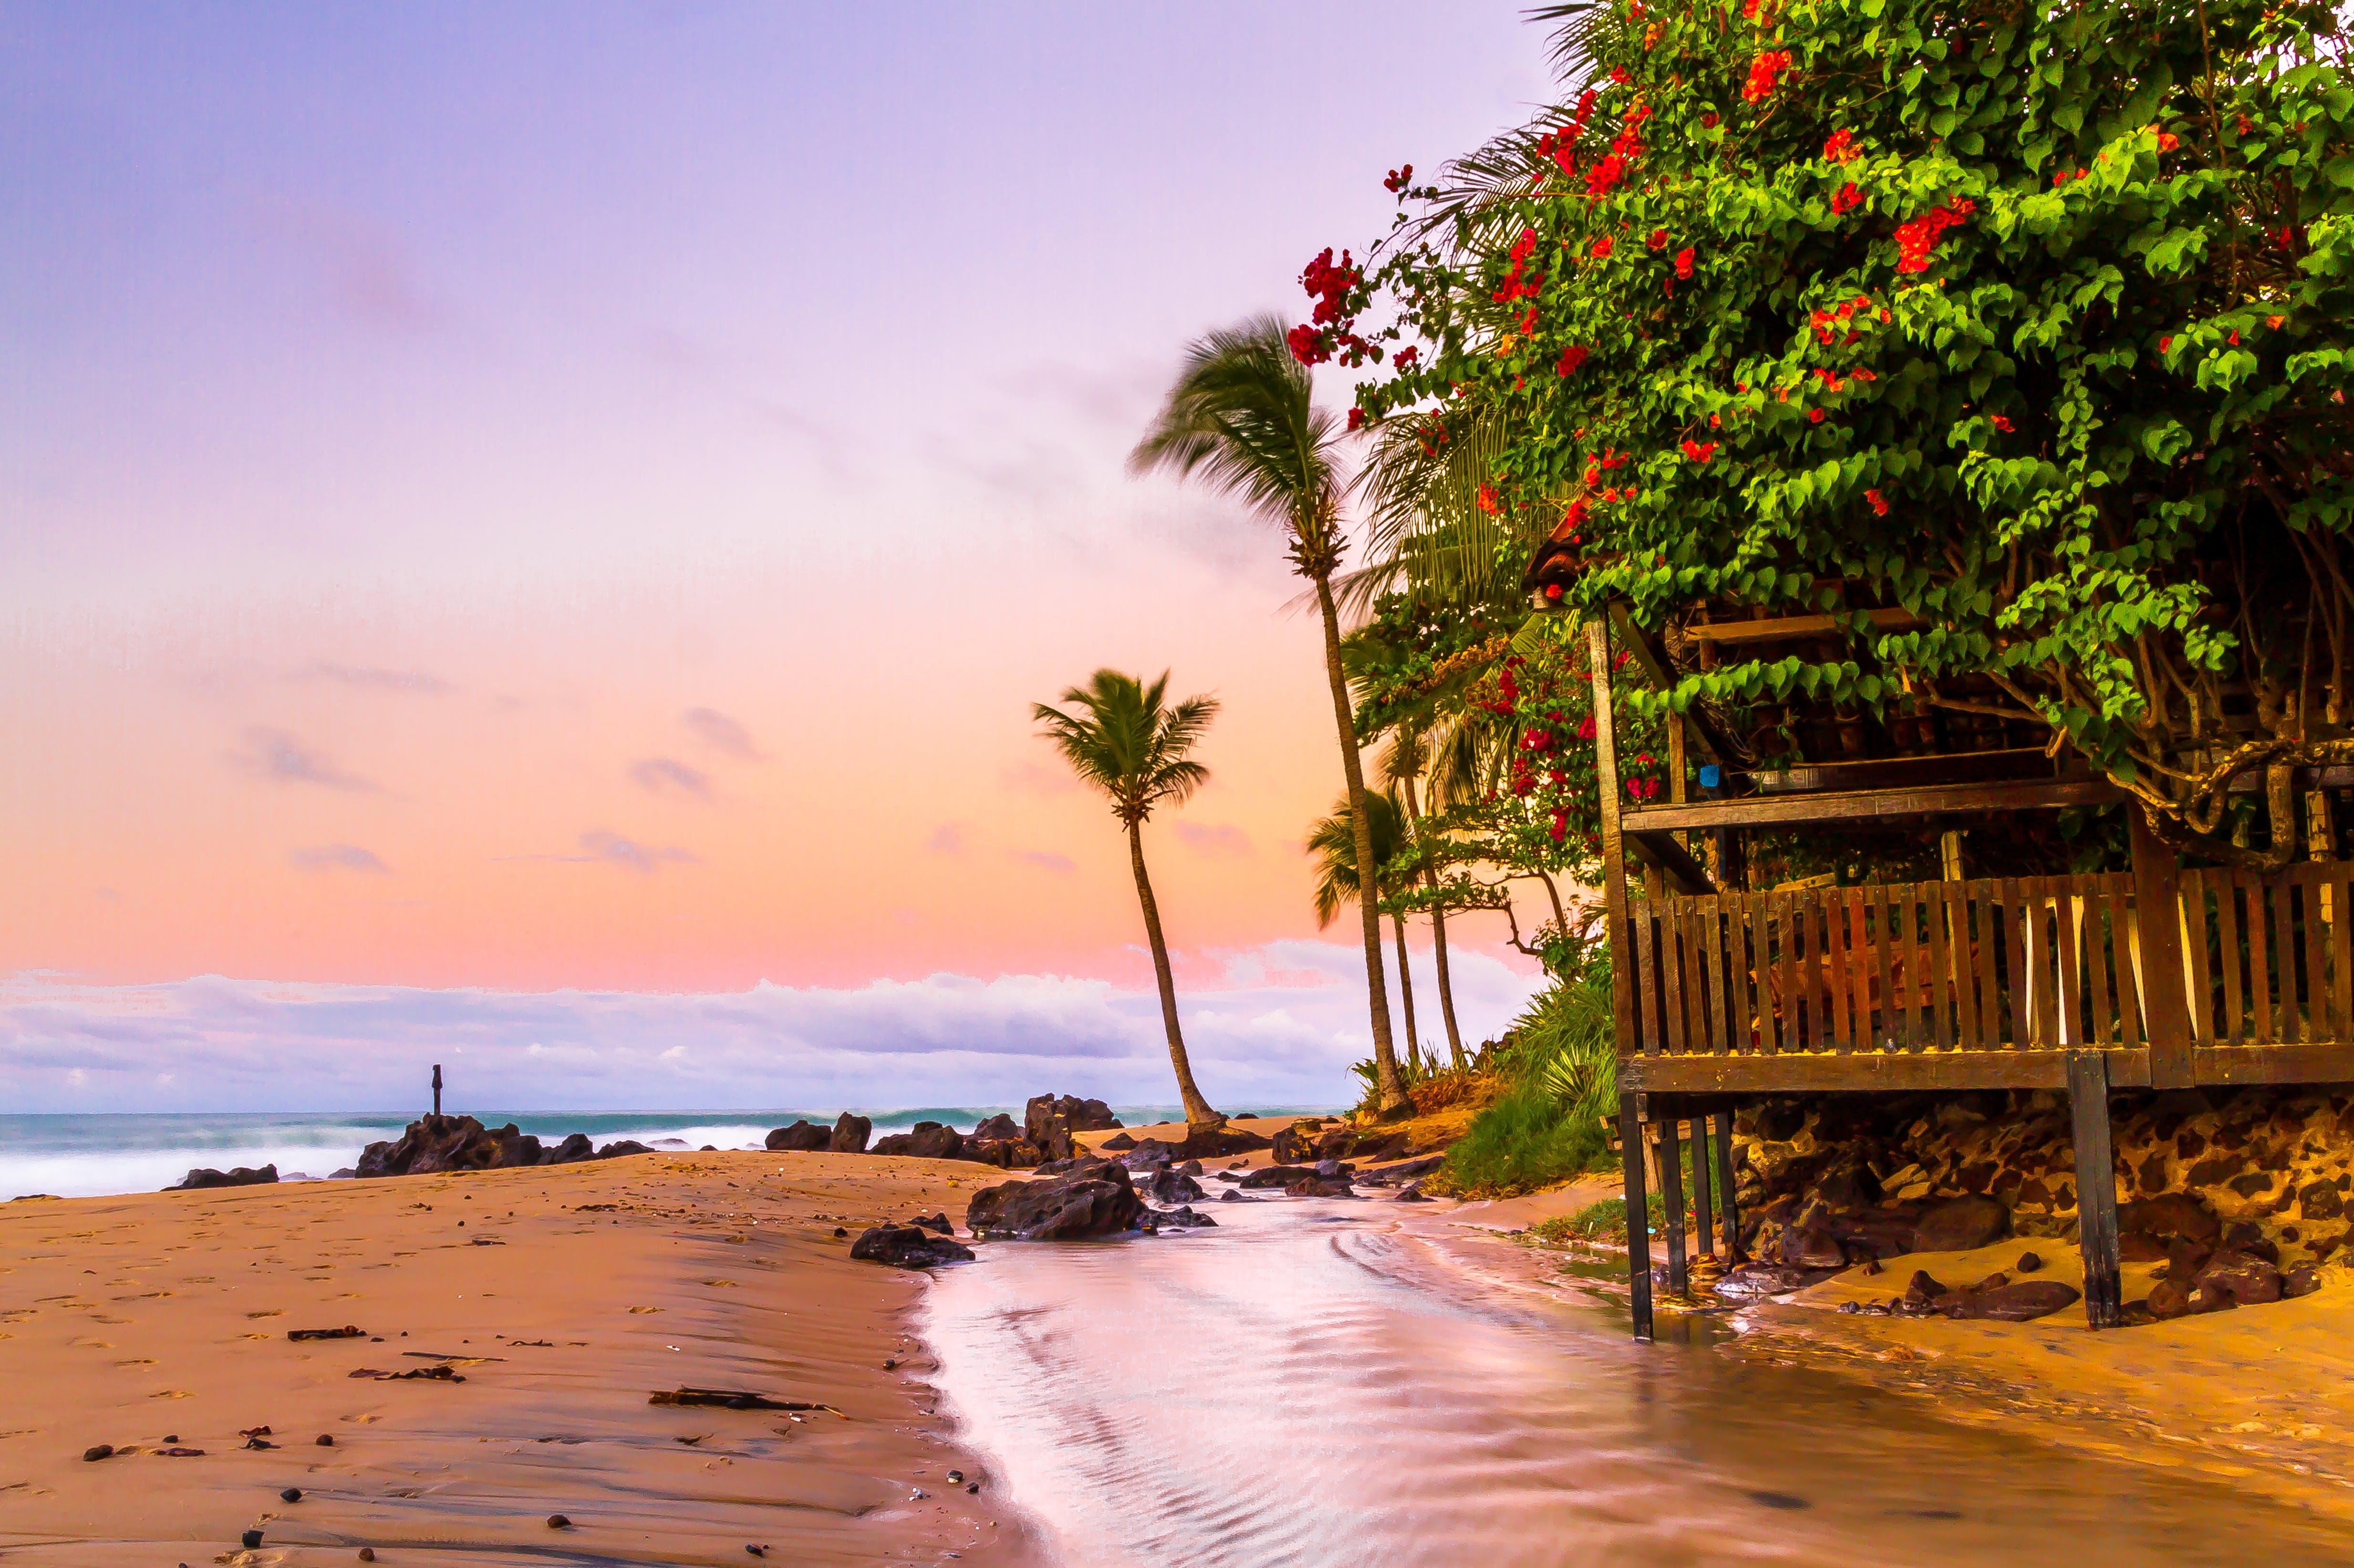 Безкоштовне стокове фото на тему «берег, берег моря, дерева, море»